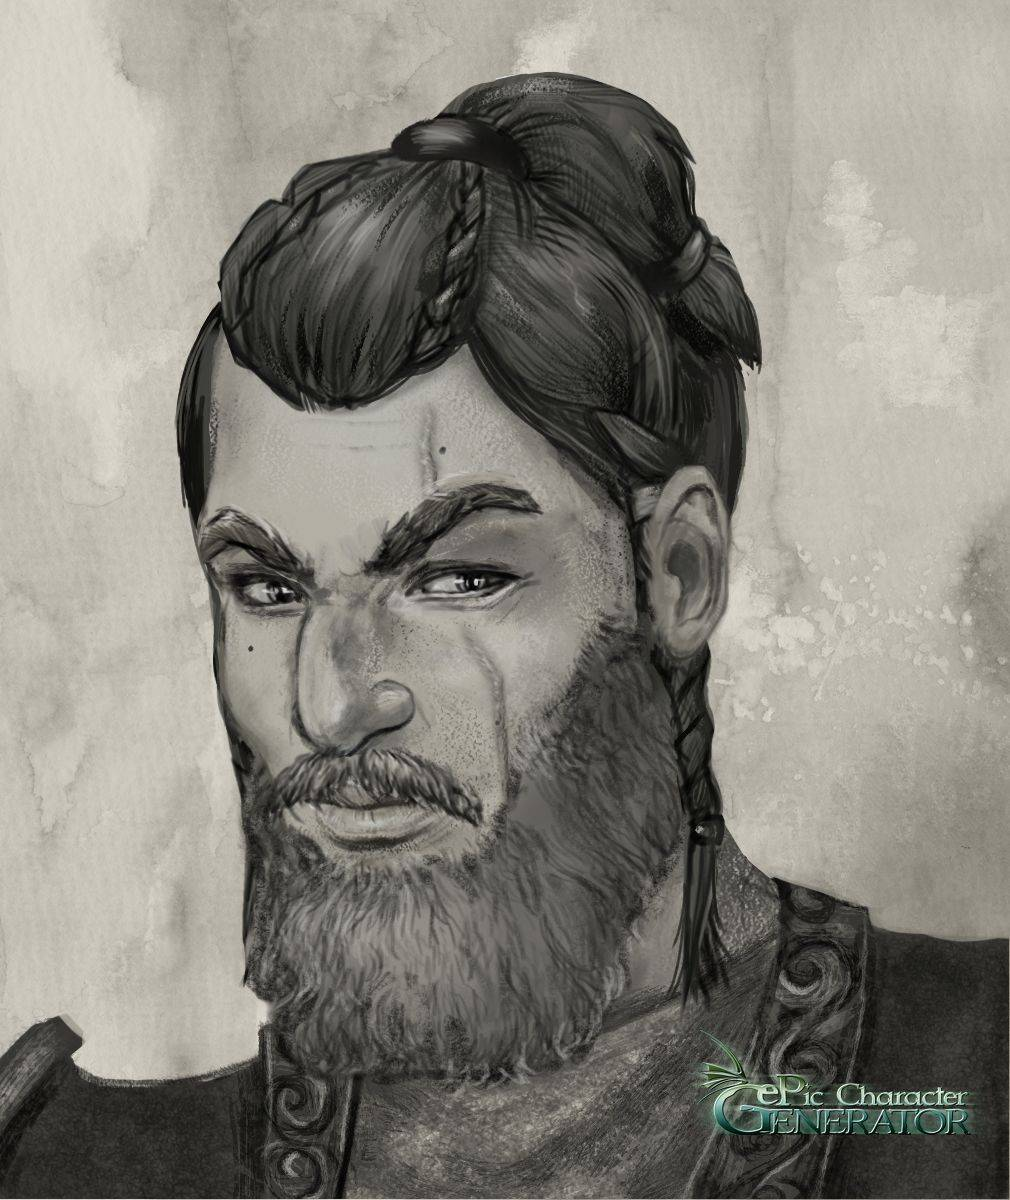 ePic Character Generator Season 3 Male Portrait Screenshot 11